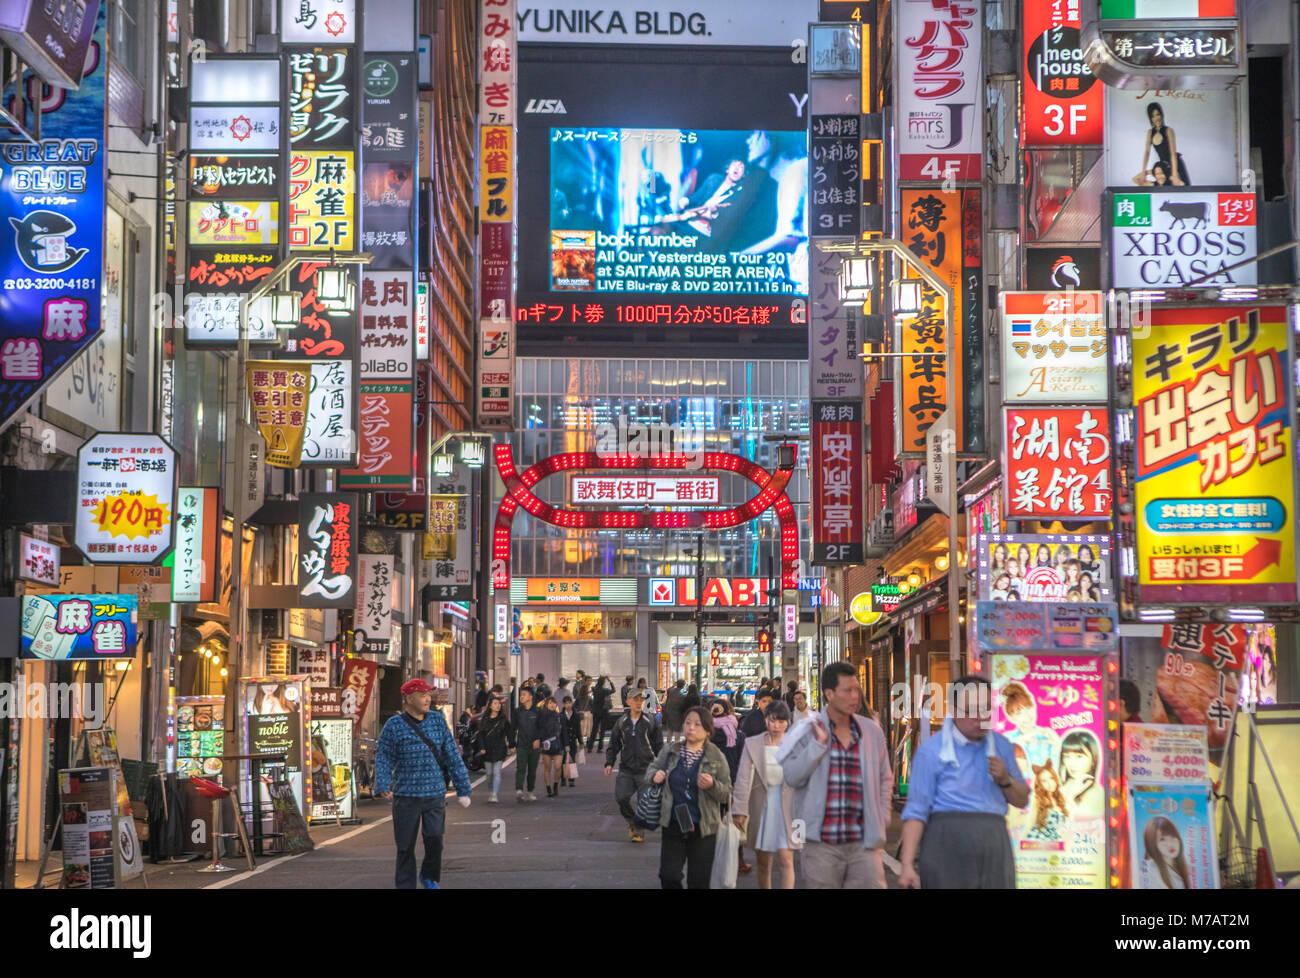 Le Japon, la ville de Tokyo, Shinjuku, quartier de Kabukicho, Photo Stock